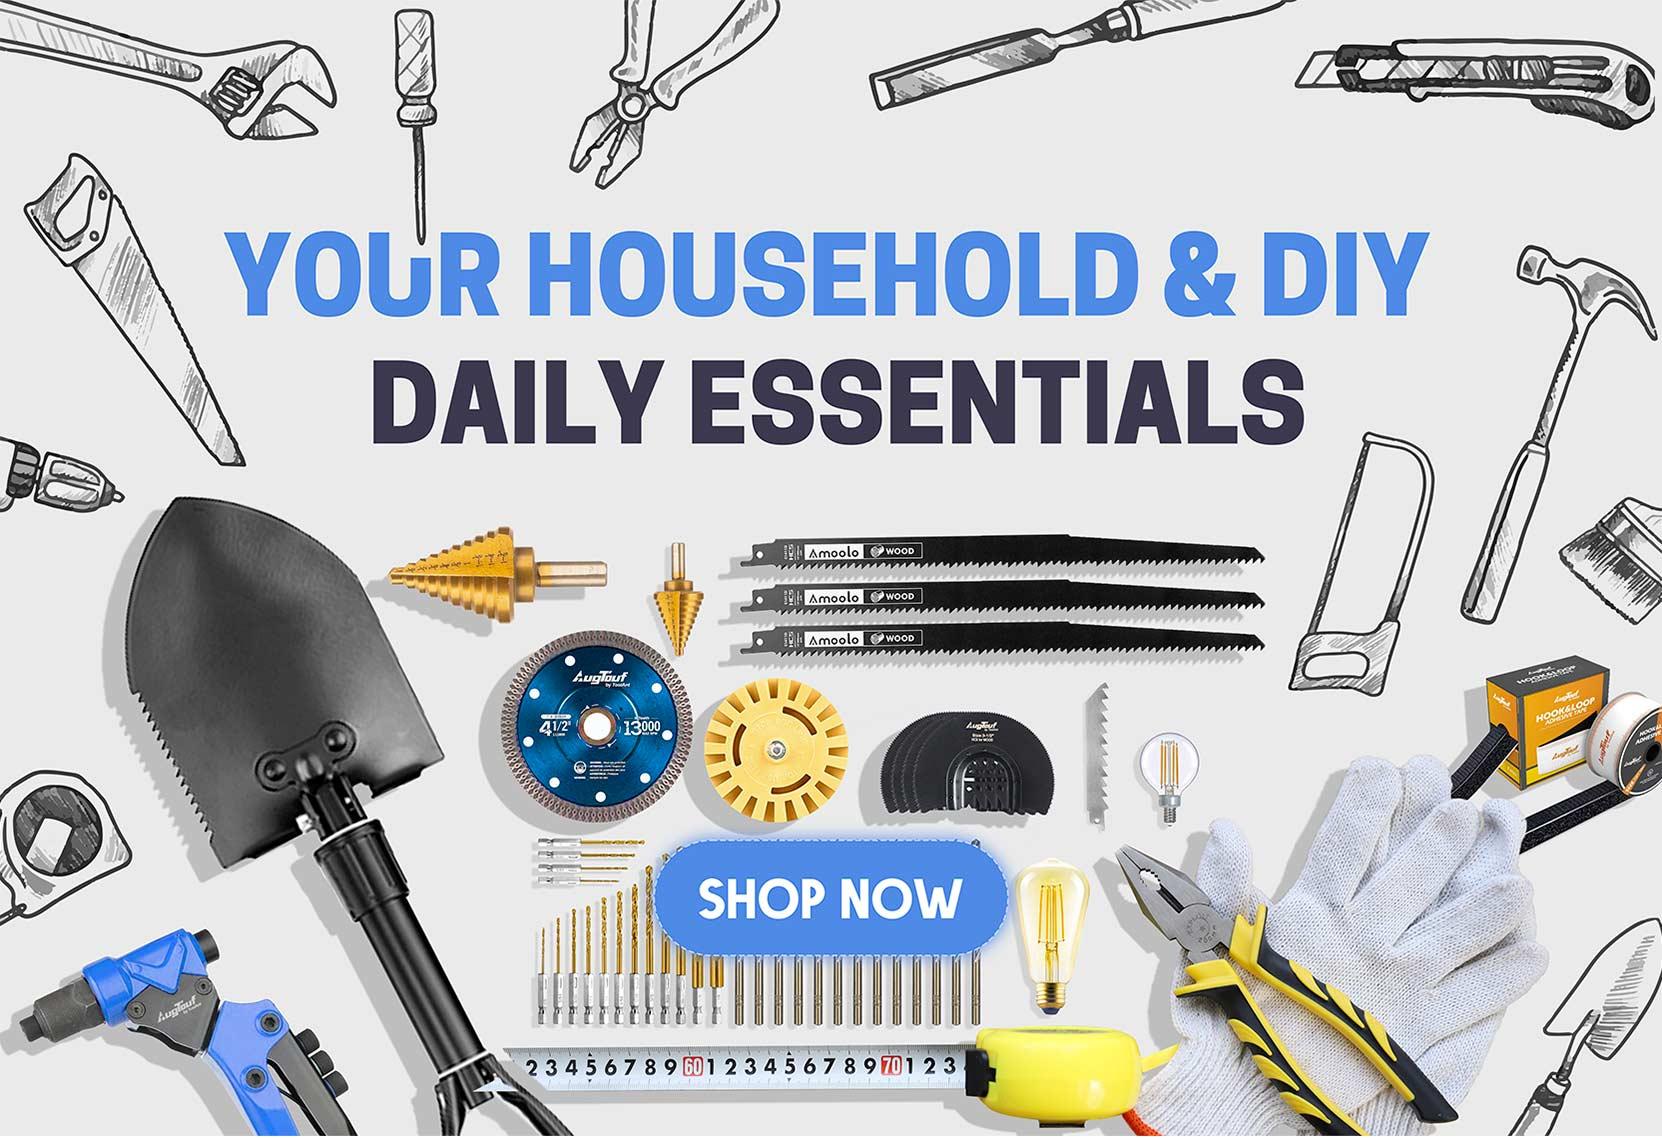 House Improvement Diy essentials